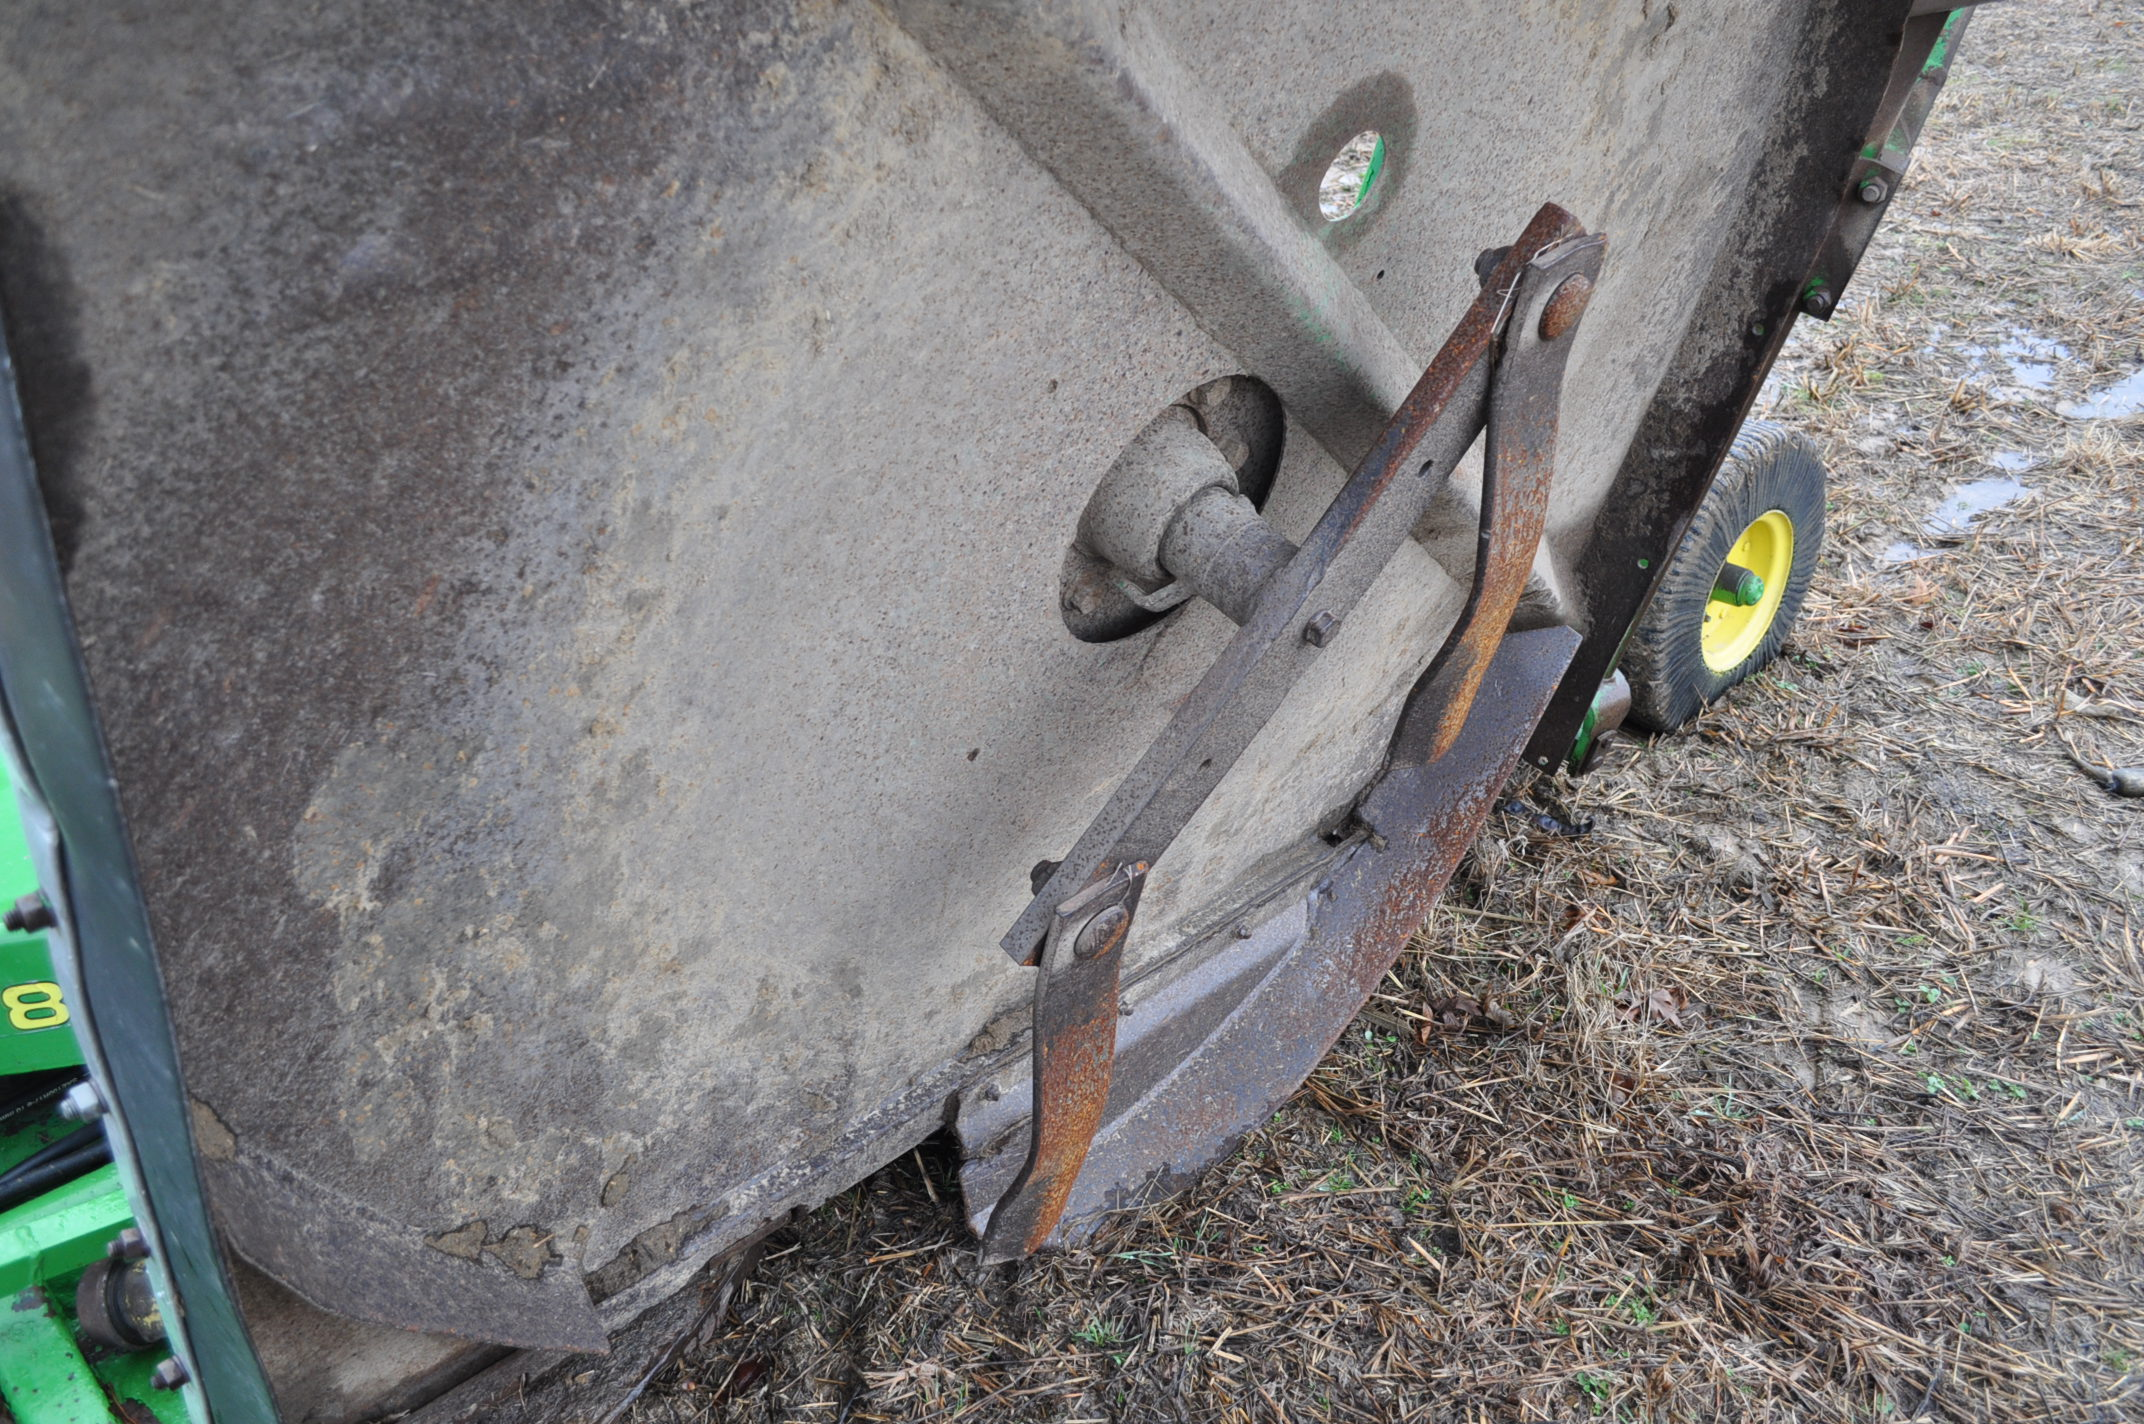 15' John Deere 1508 rotary mower, hyd fold, 1000 pto - Image 11 of 13